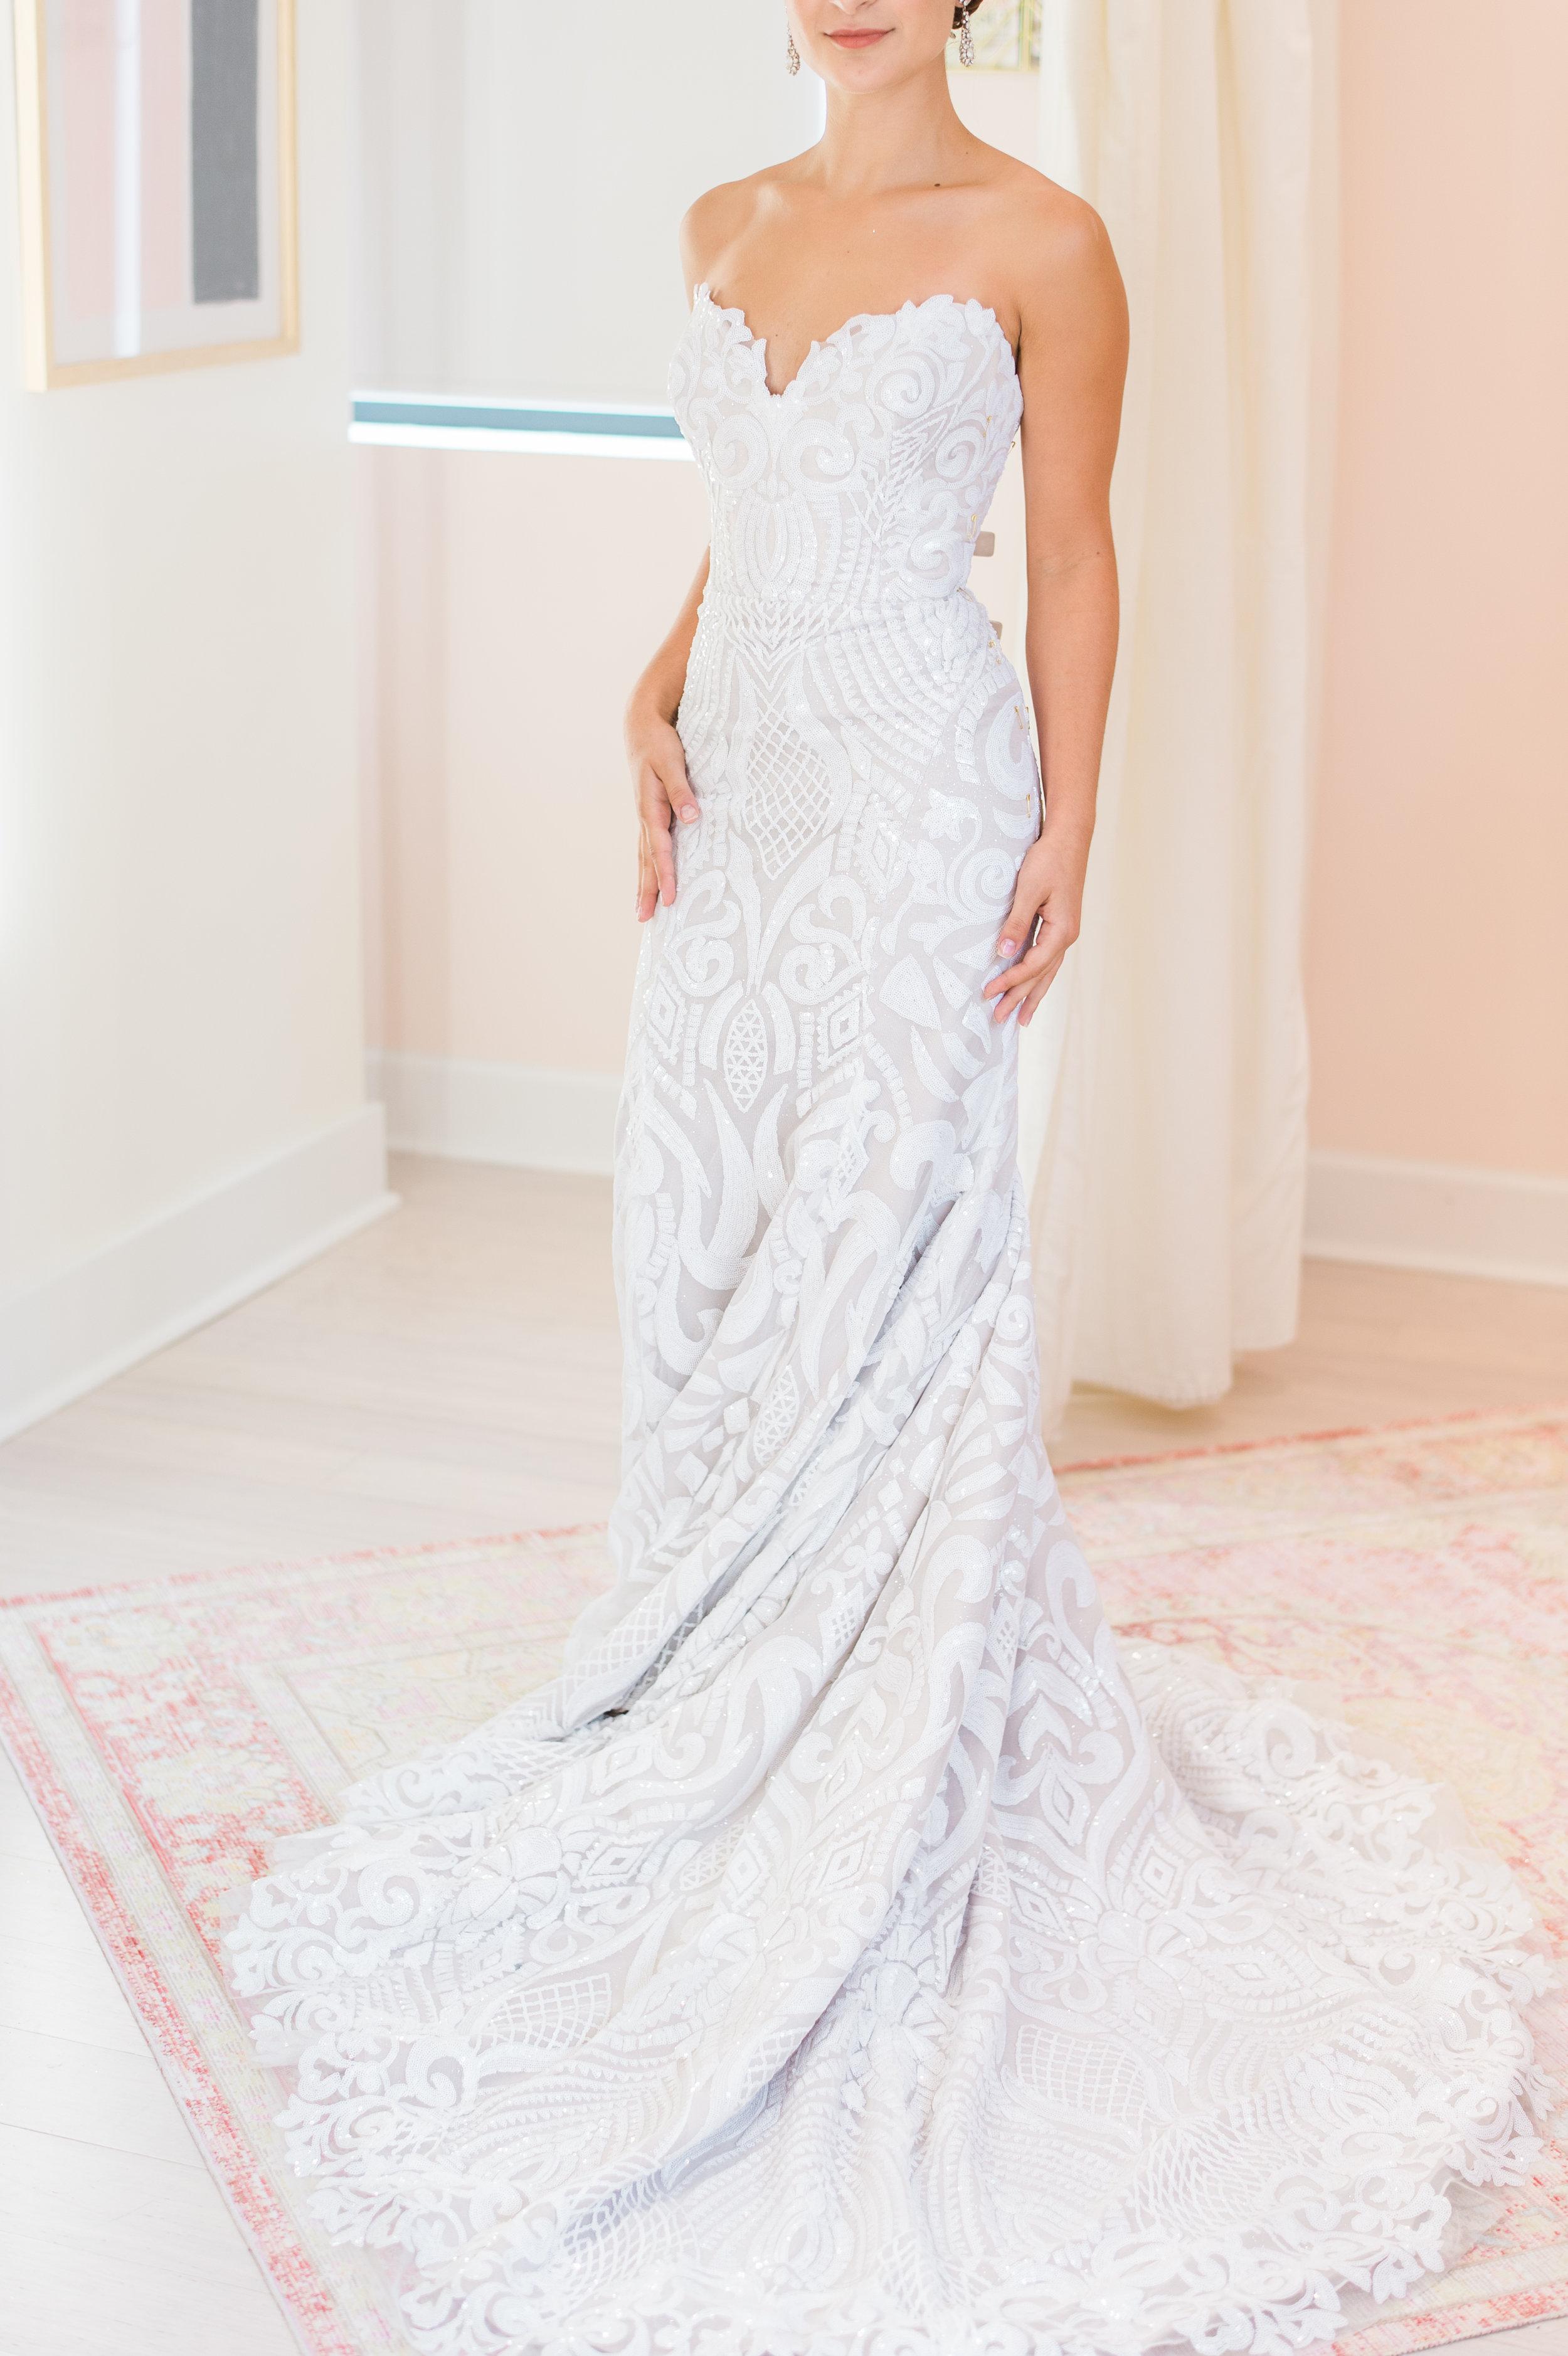 luck love photography - northern virginia wedding photographer - the bridal room va - the dresses-11.jpg